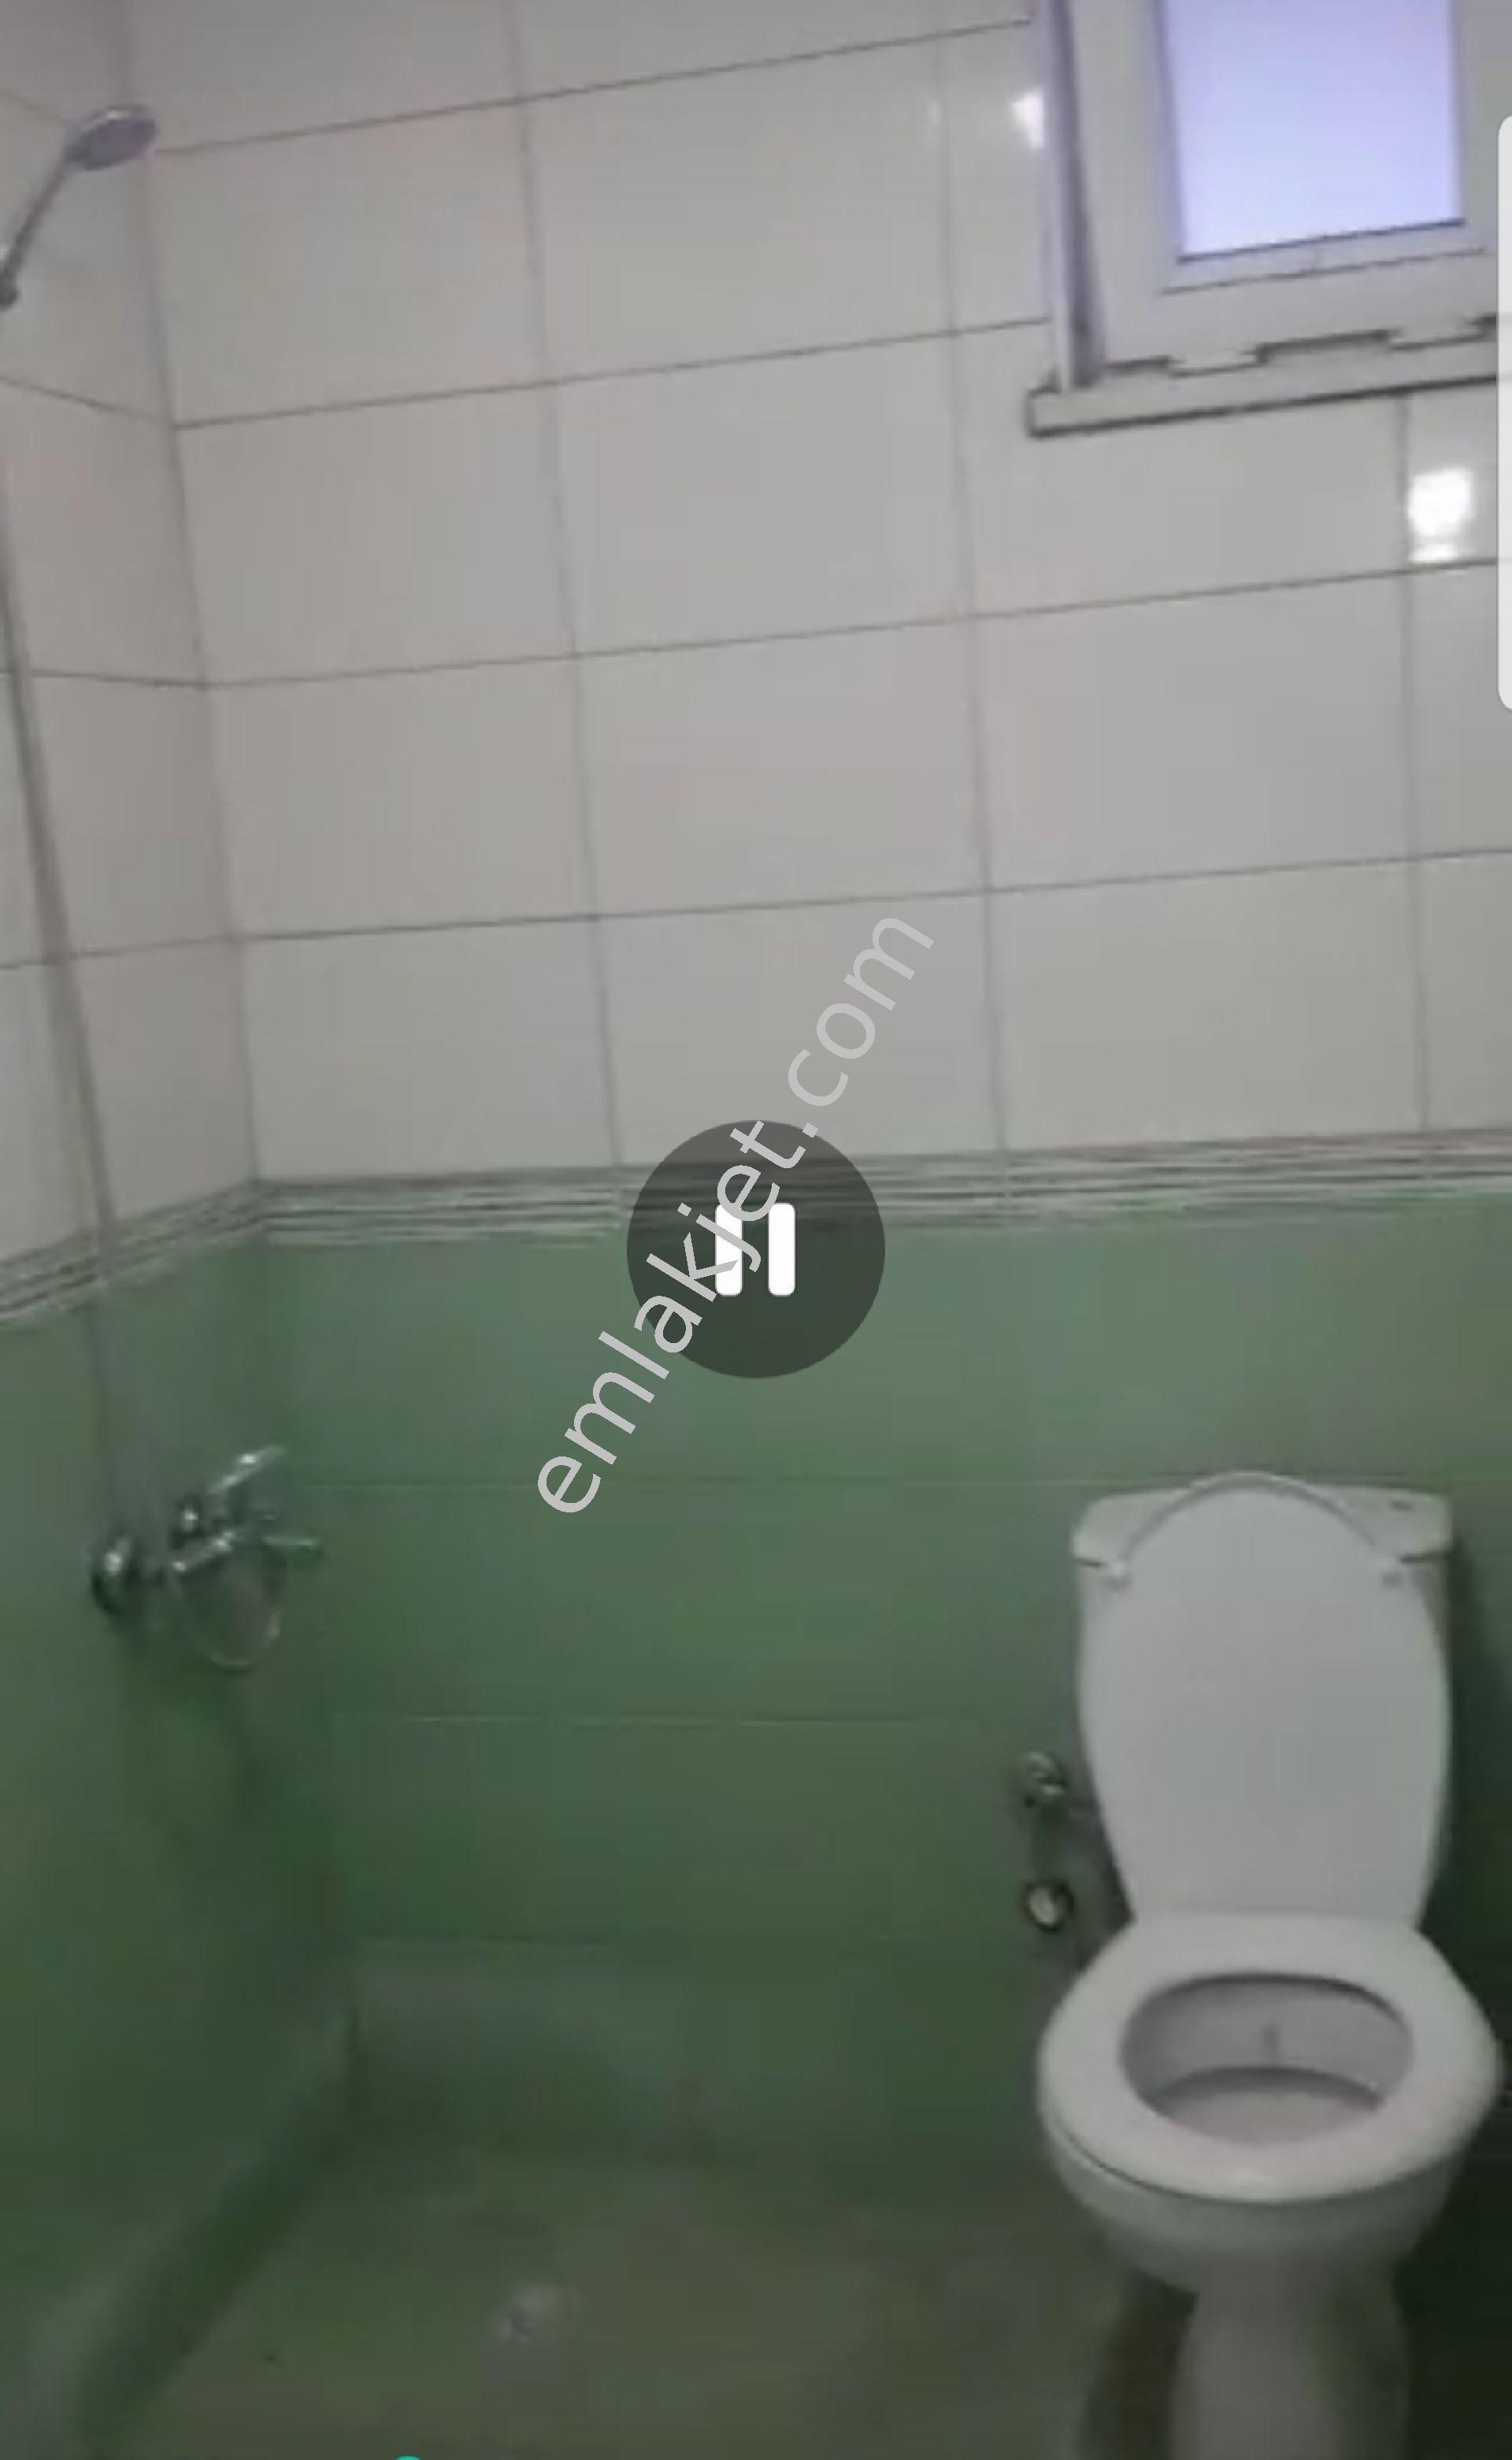 https://imaj.emlakjet.com/listing/9004026/FB14F17356A623901E443B16E314C5DD9004026.jpg